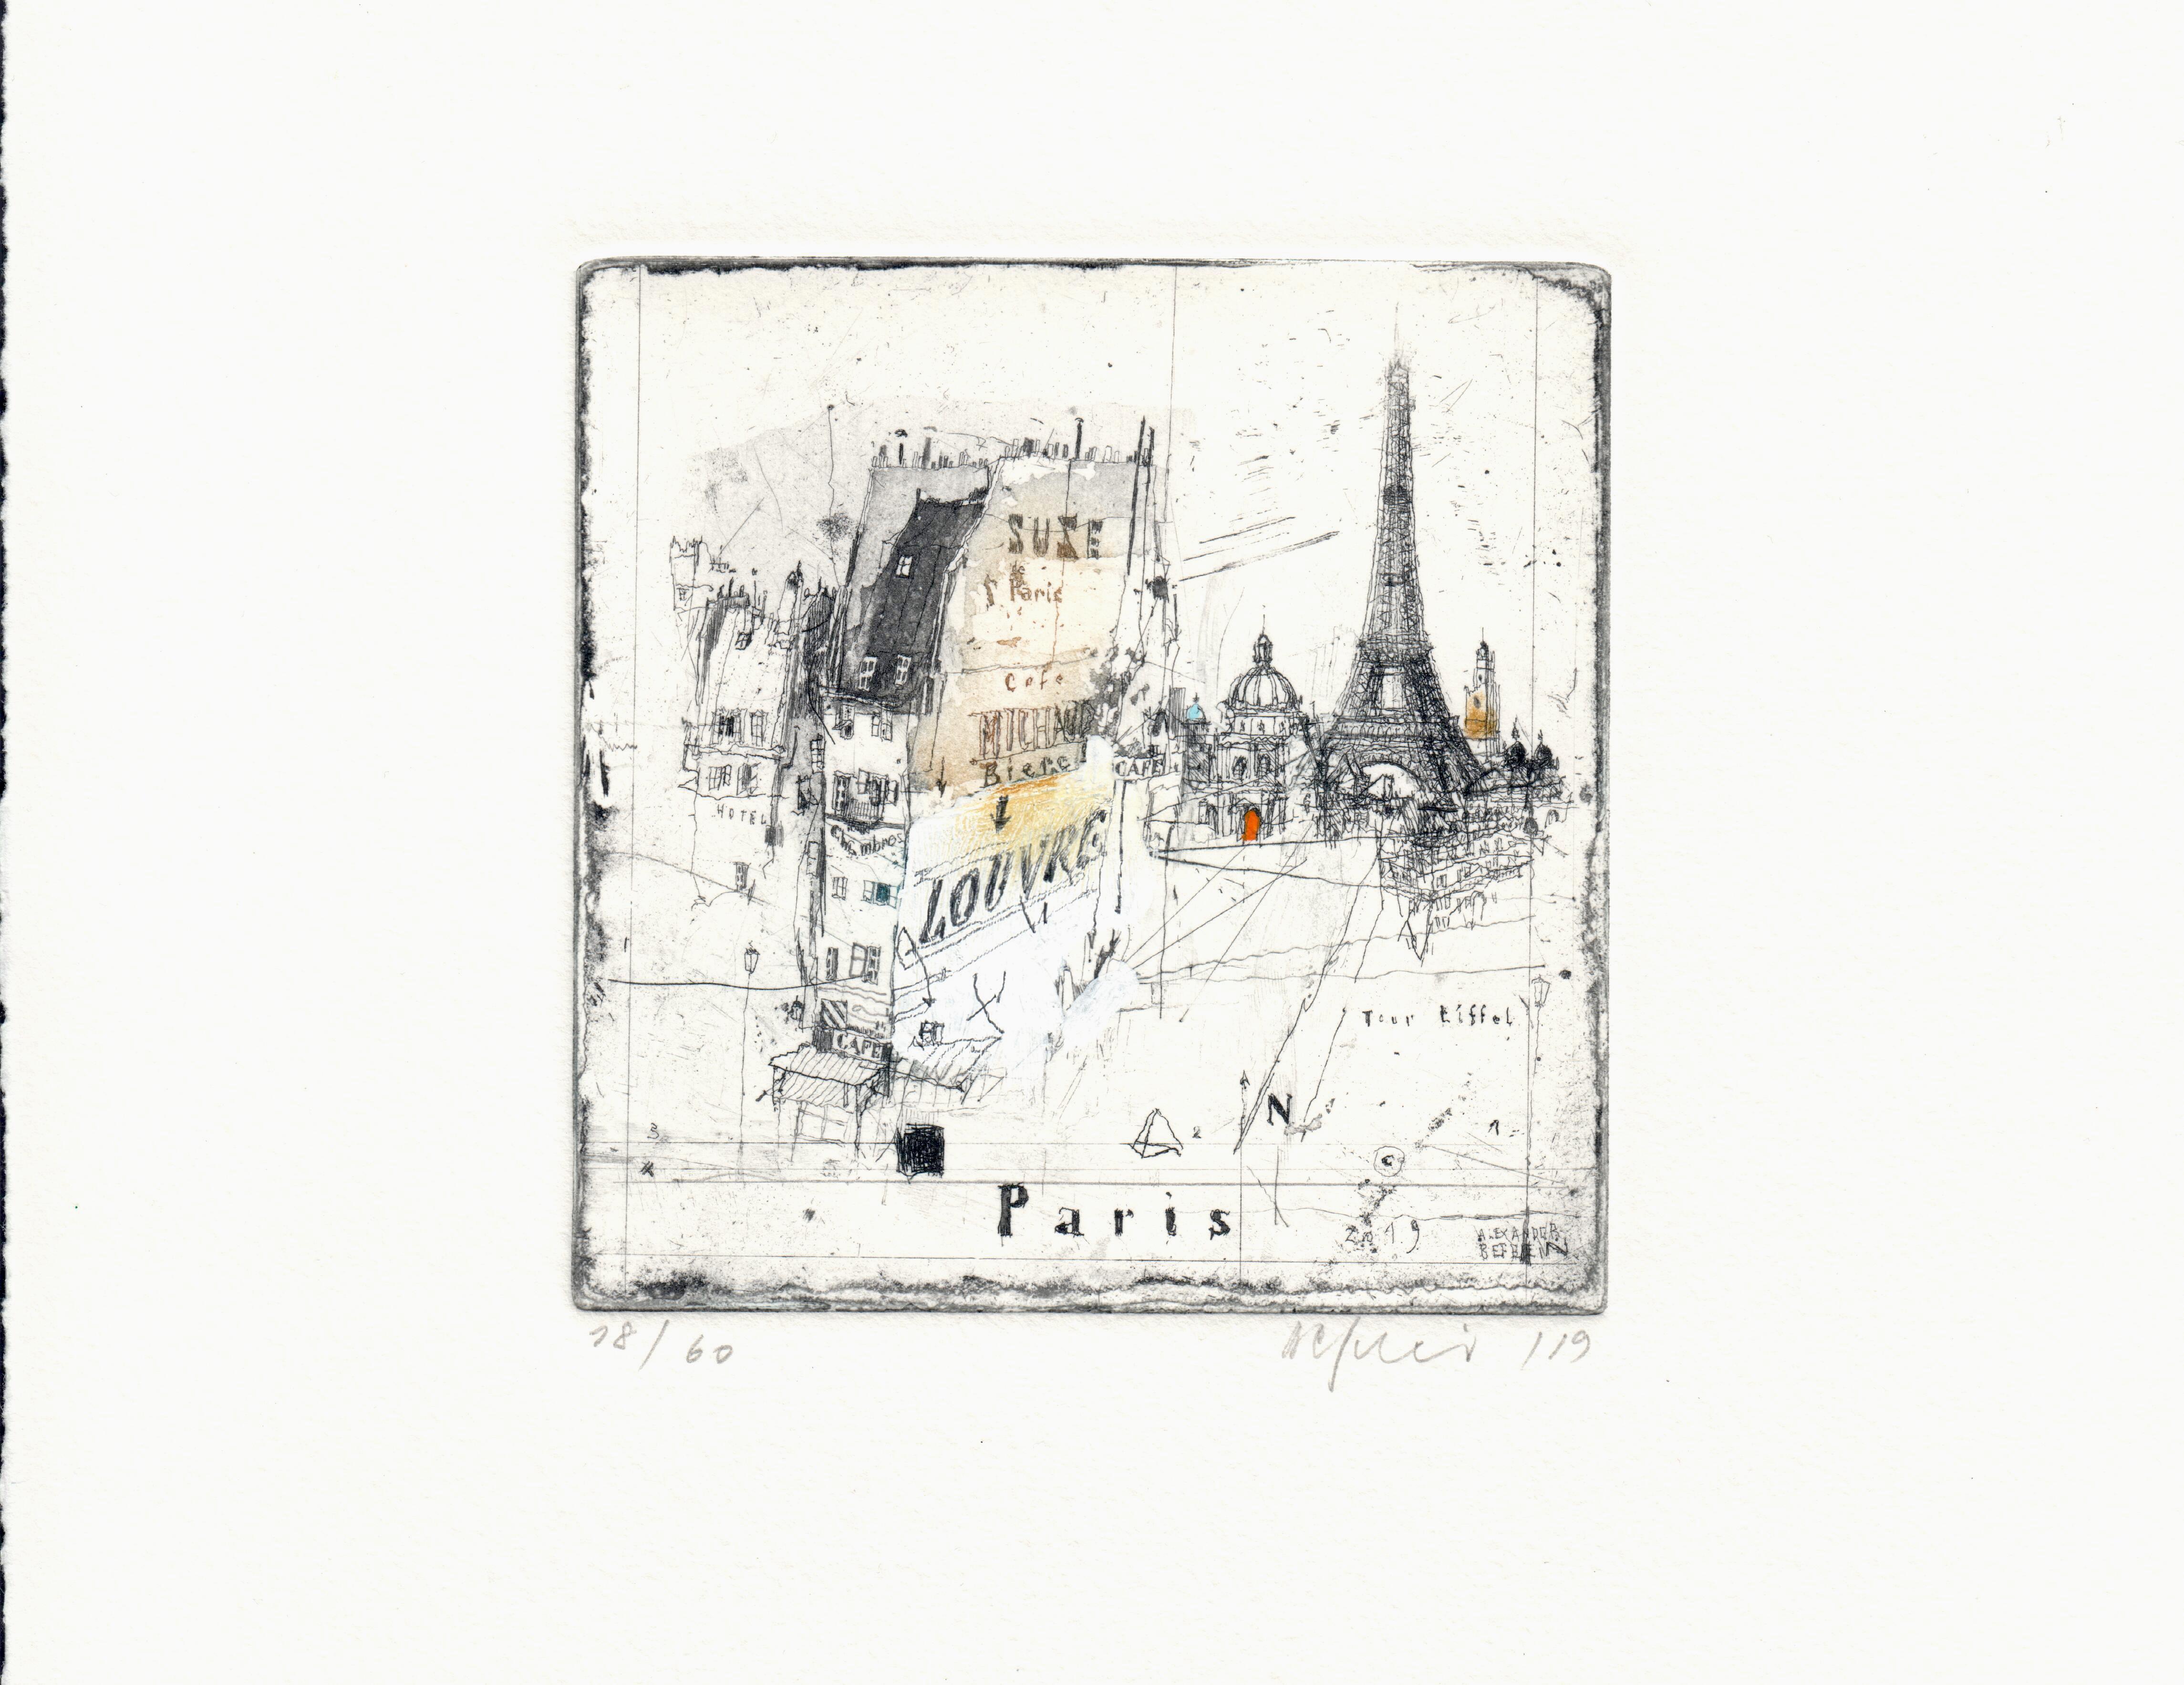 Paris, Alexander Befelein Contemporary Limited Edition Print Etching